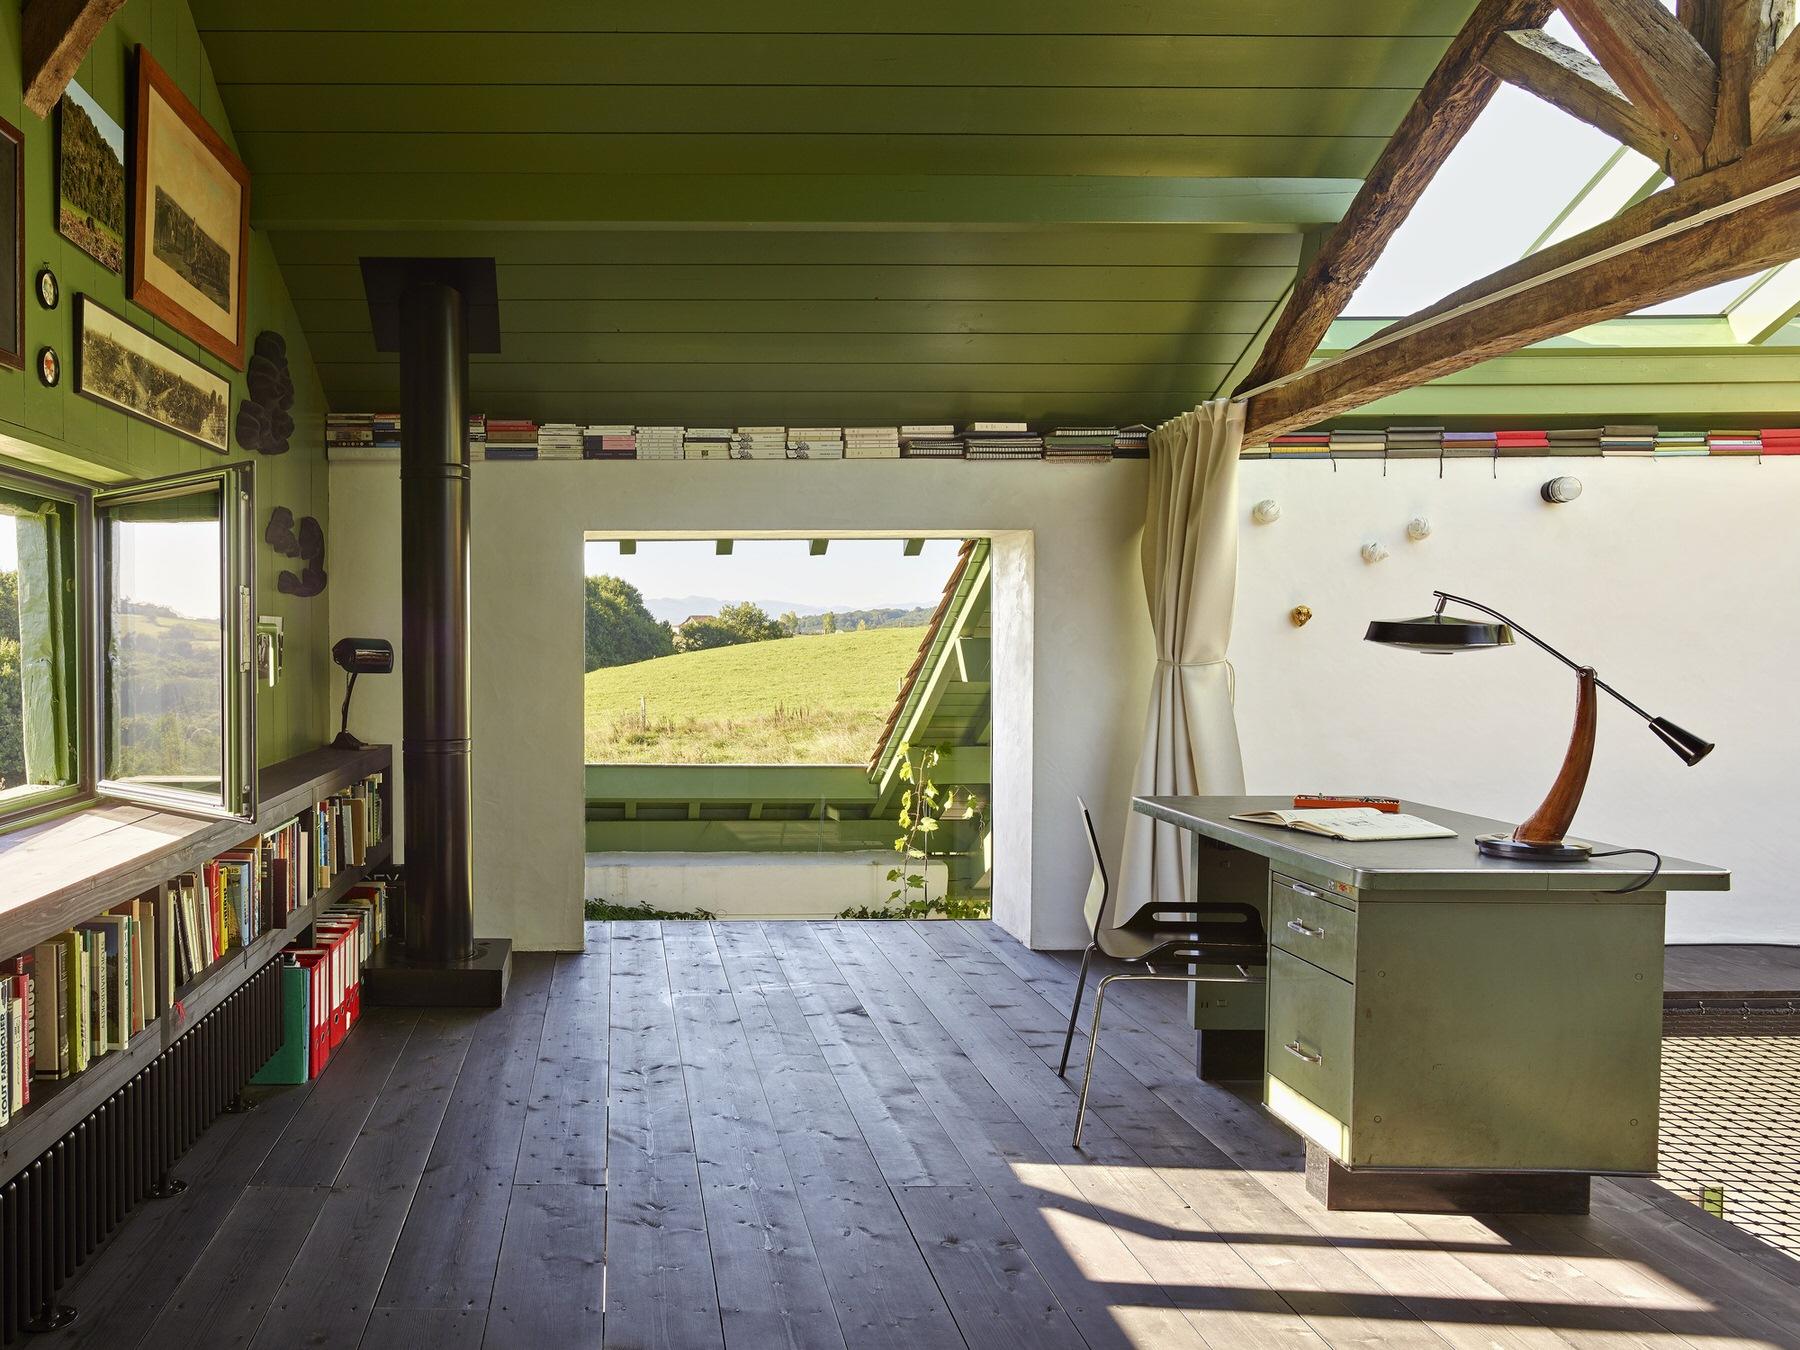 Collectif Encore, Hourre House Labastide Villefranche France, Barn Conversion | Yellowtrace